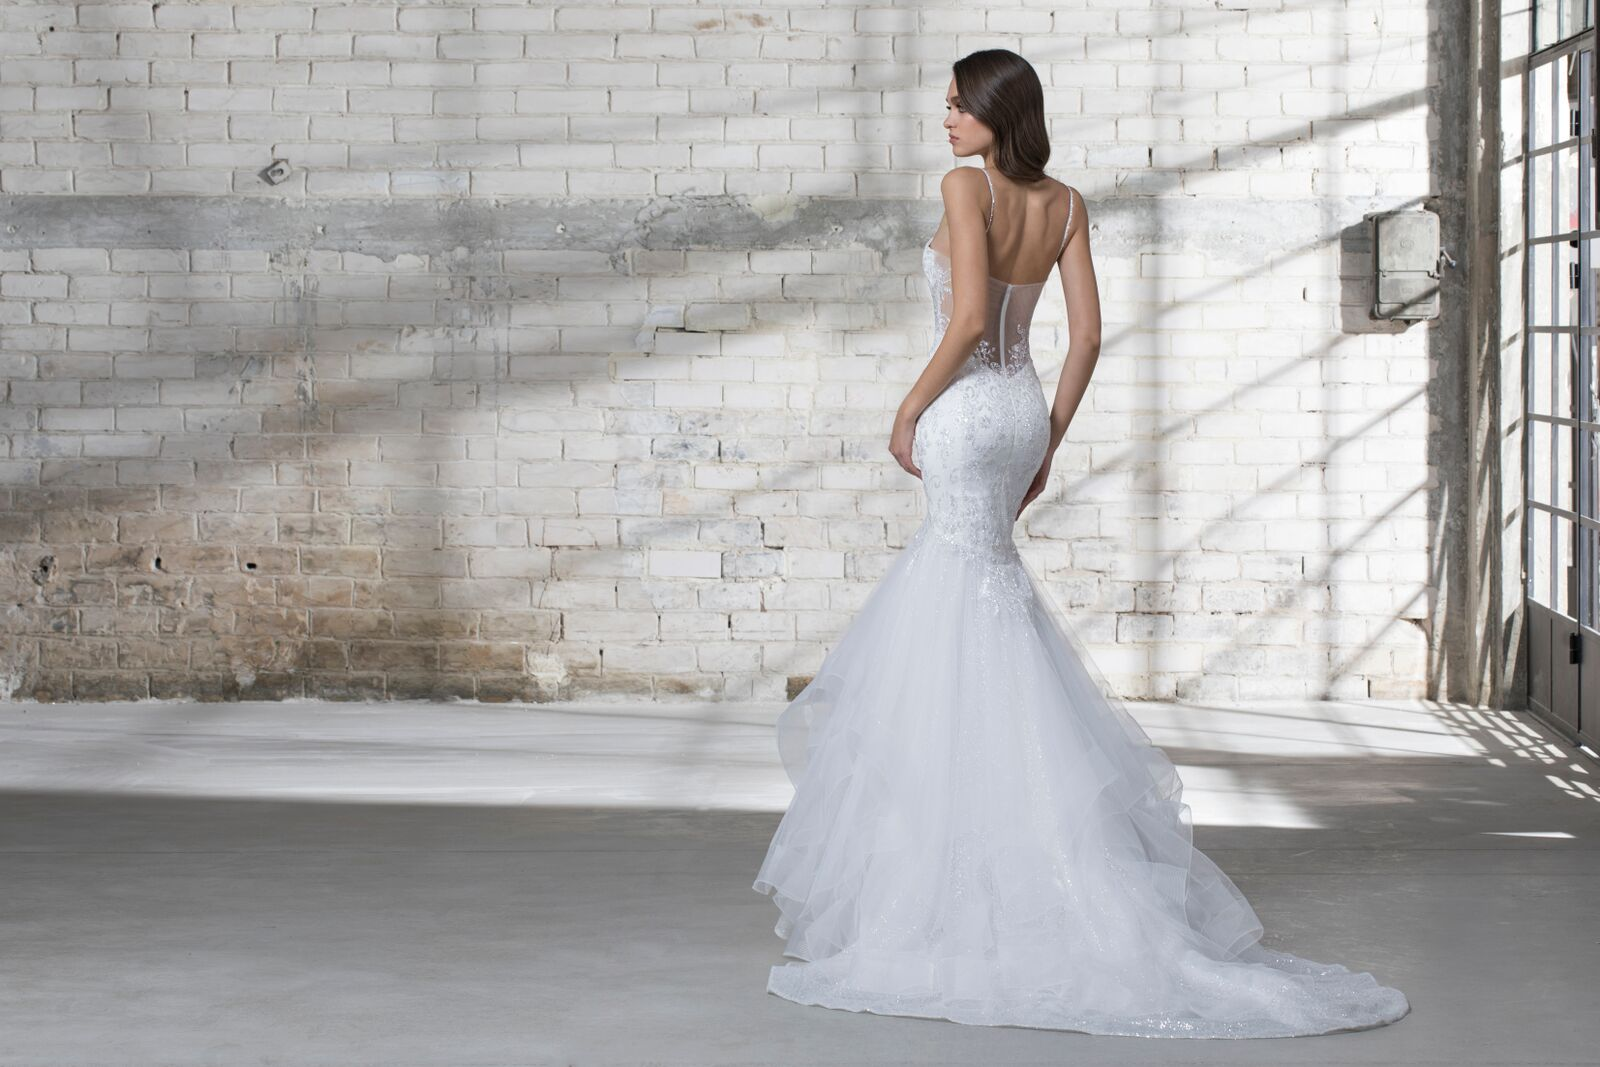 Mermaid Spaghetti Strap Wedding Dress